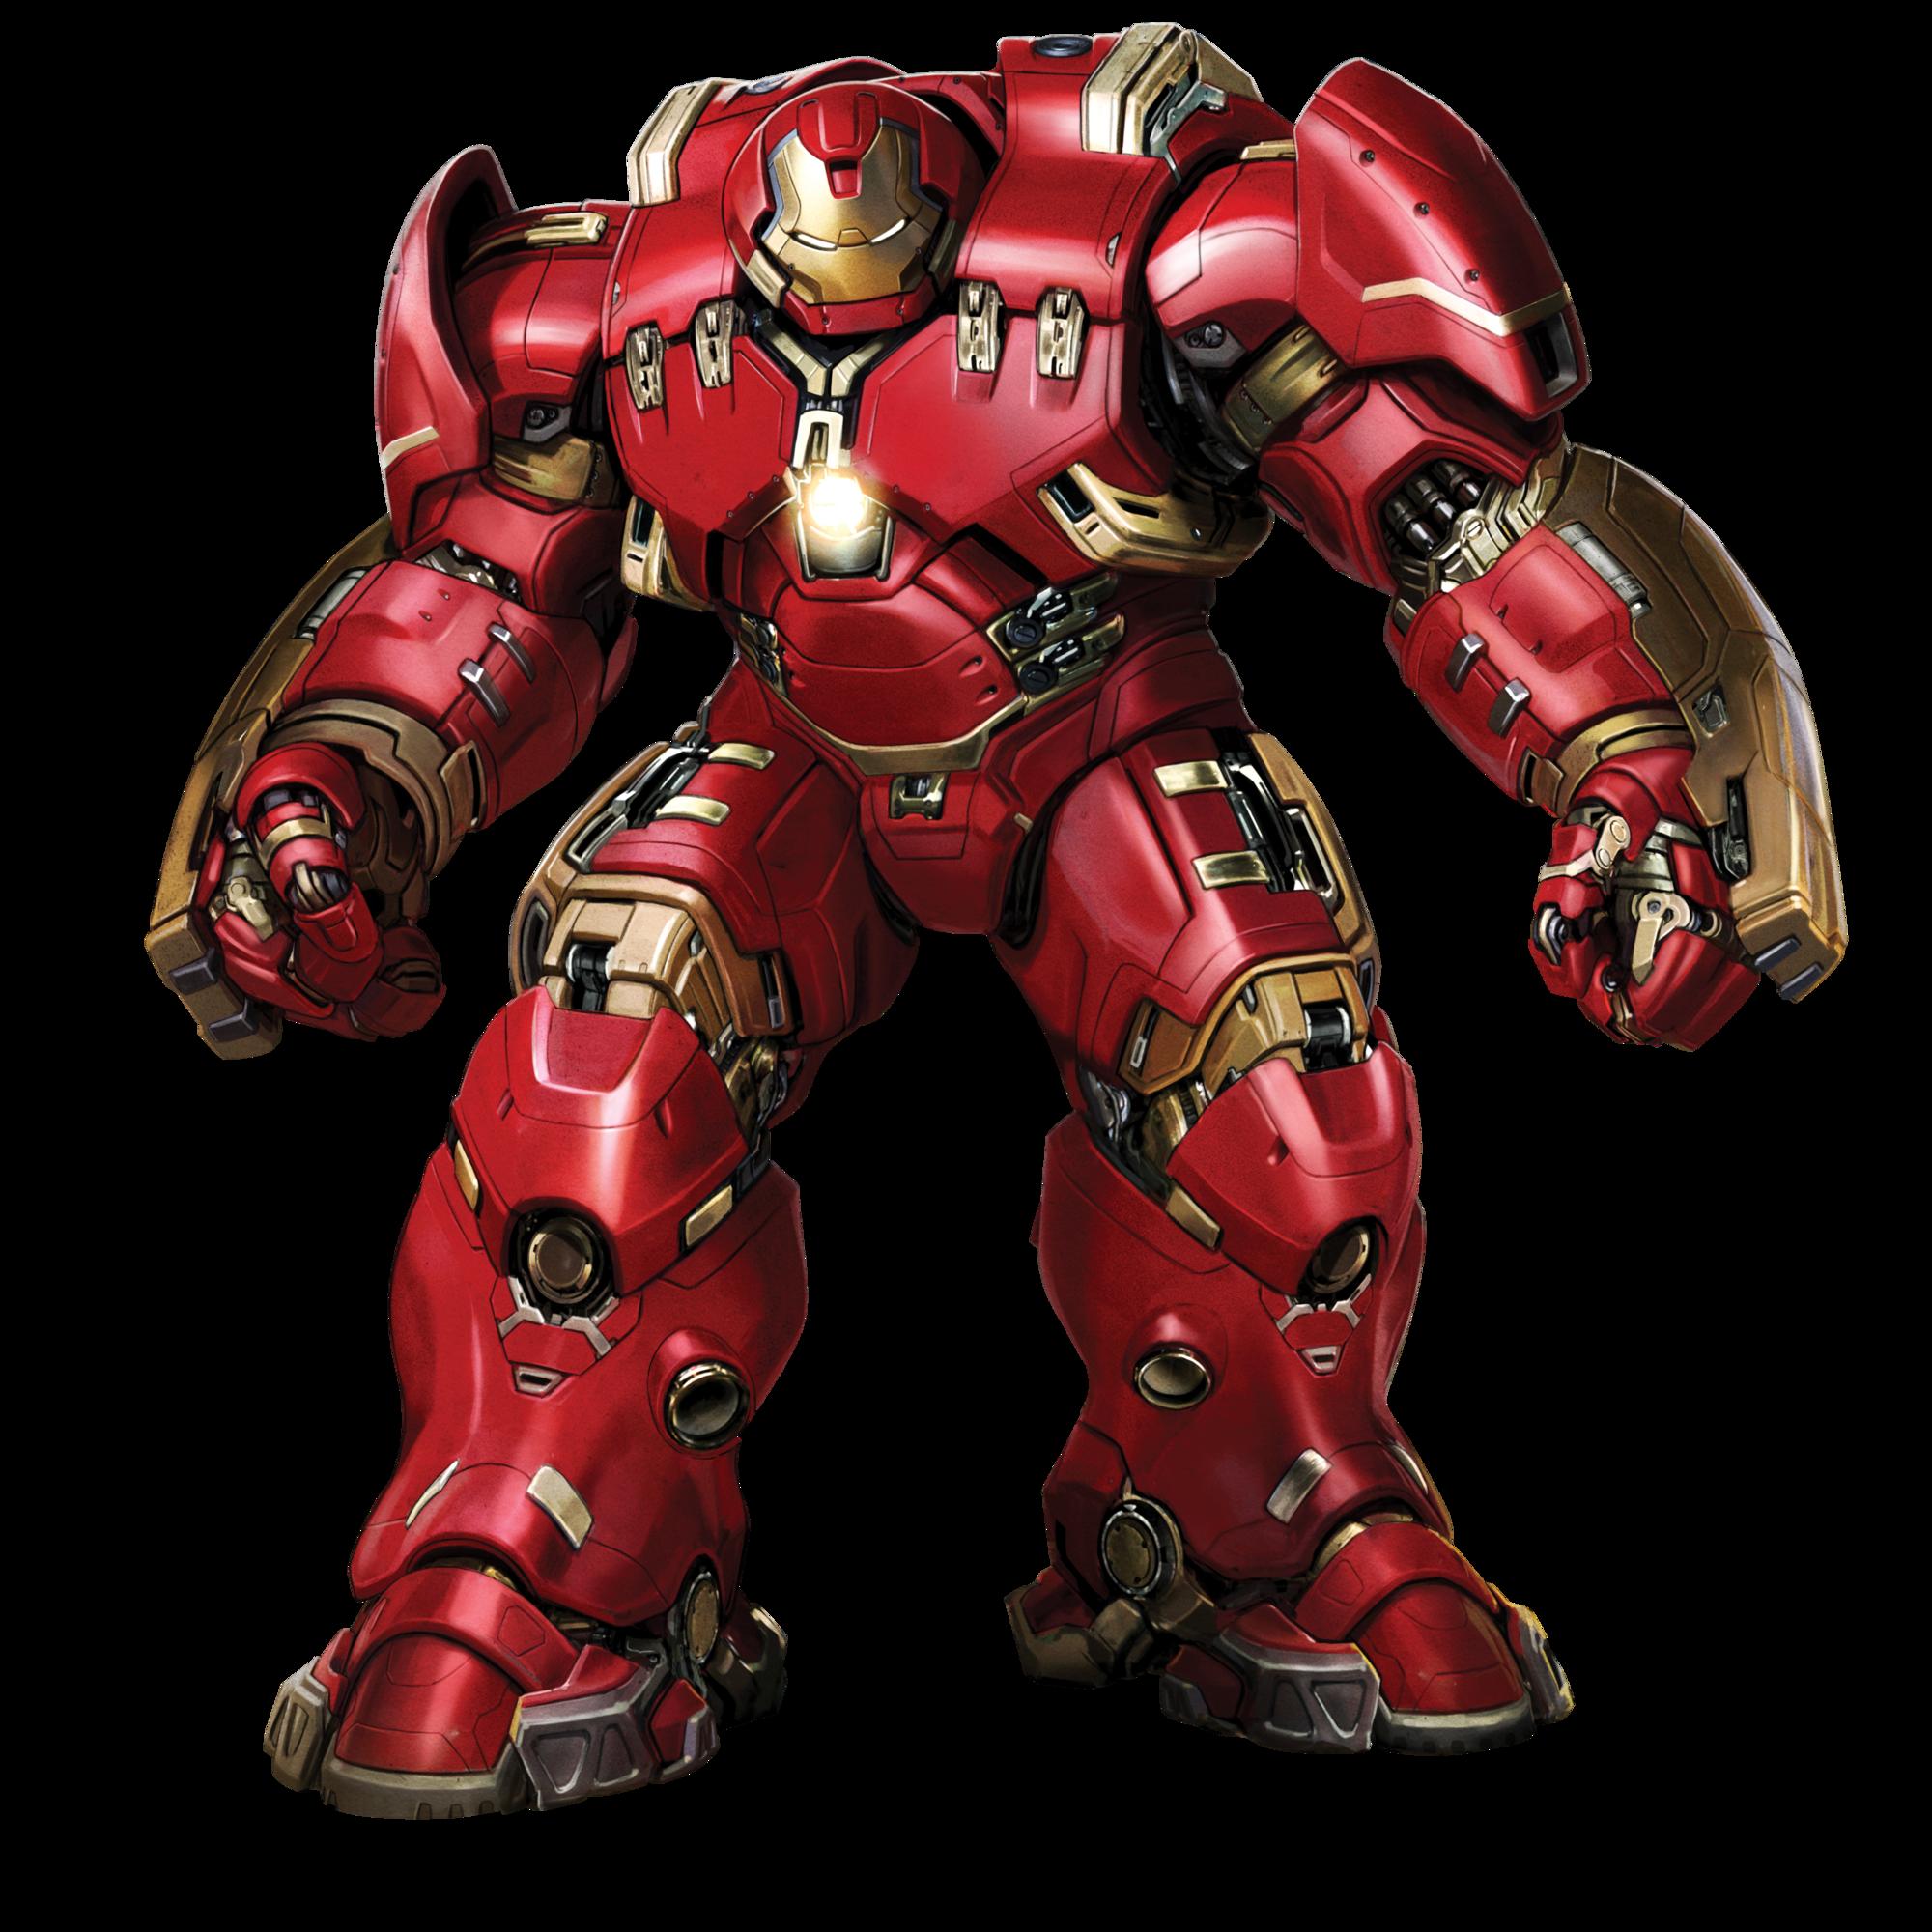 Iron Man Armor Mark Xliv Iron Man Armor Hulkbuster Iron Man Avengers